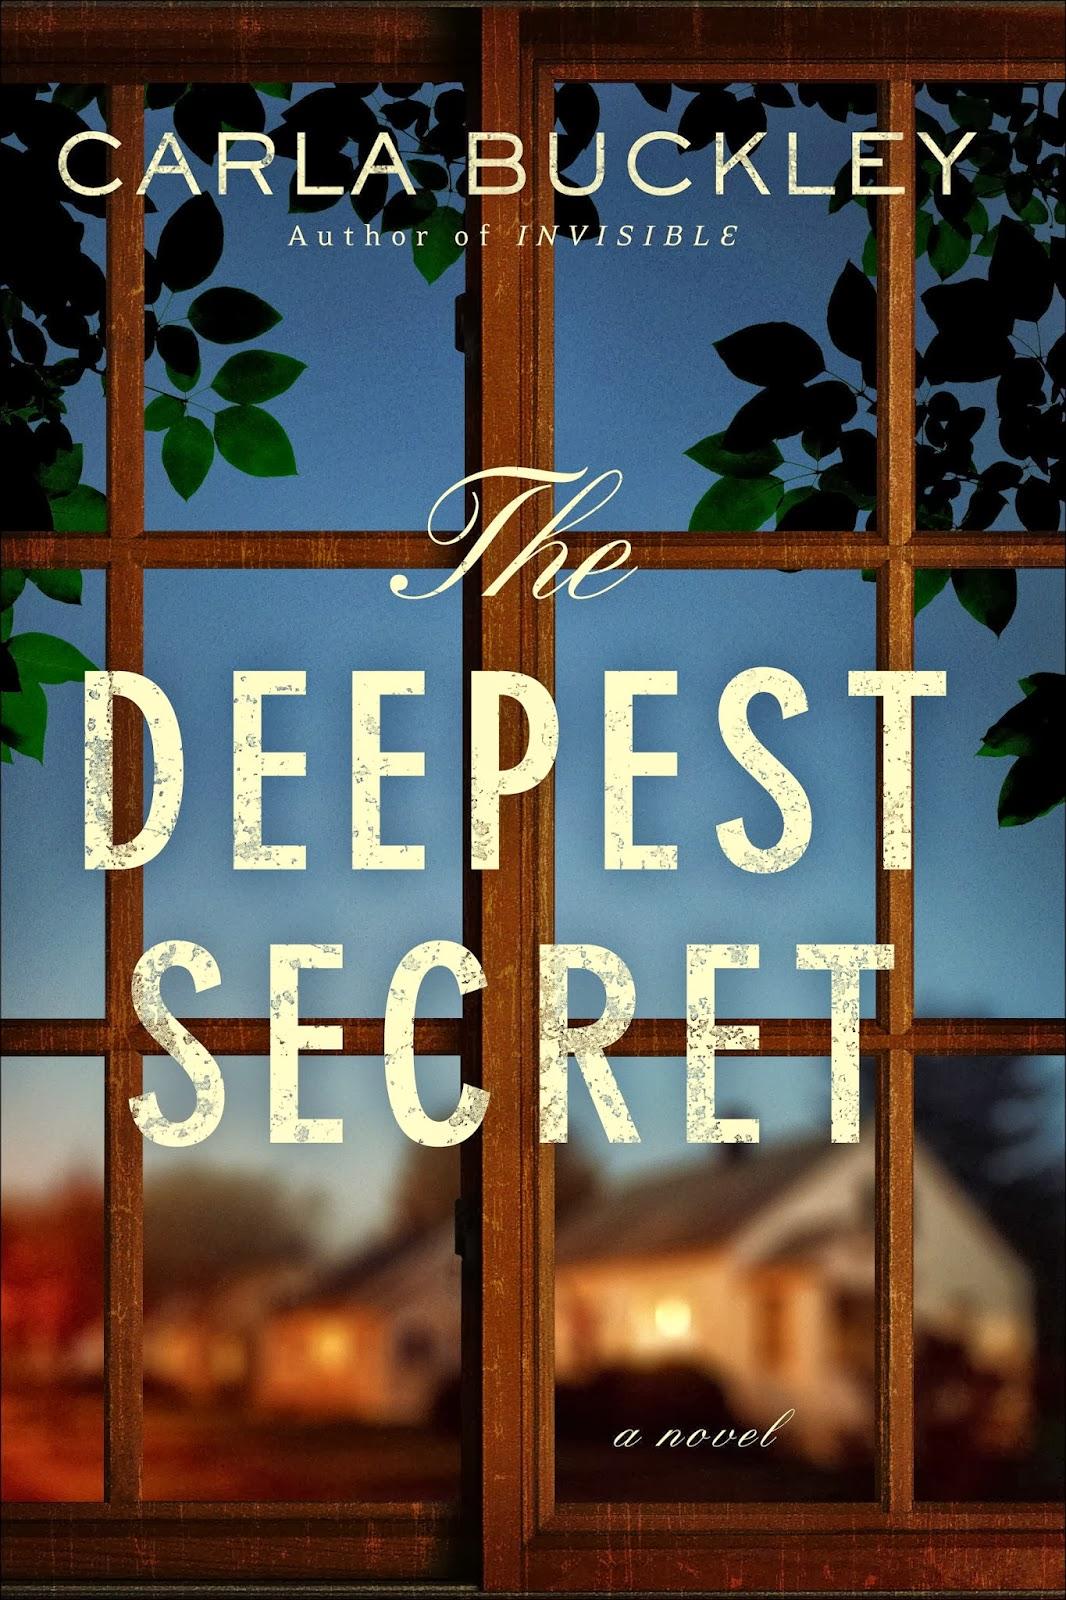 http://www.georgina.canlib.ca/uhtbin/cgisirsi/x/x/x//57/5?user_id=WEBSERVER&&searchdata1=the+deepest+secret&srchfield1=TI&searchoper1=AND&searchdata2=buckley&srchfield2=AU